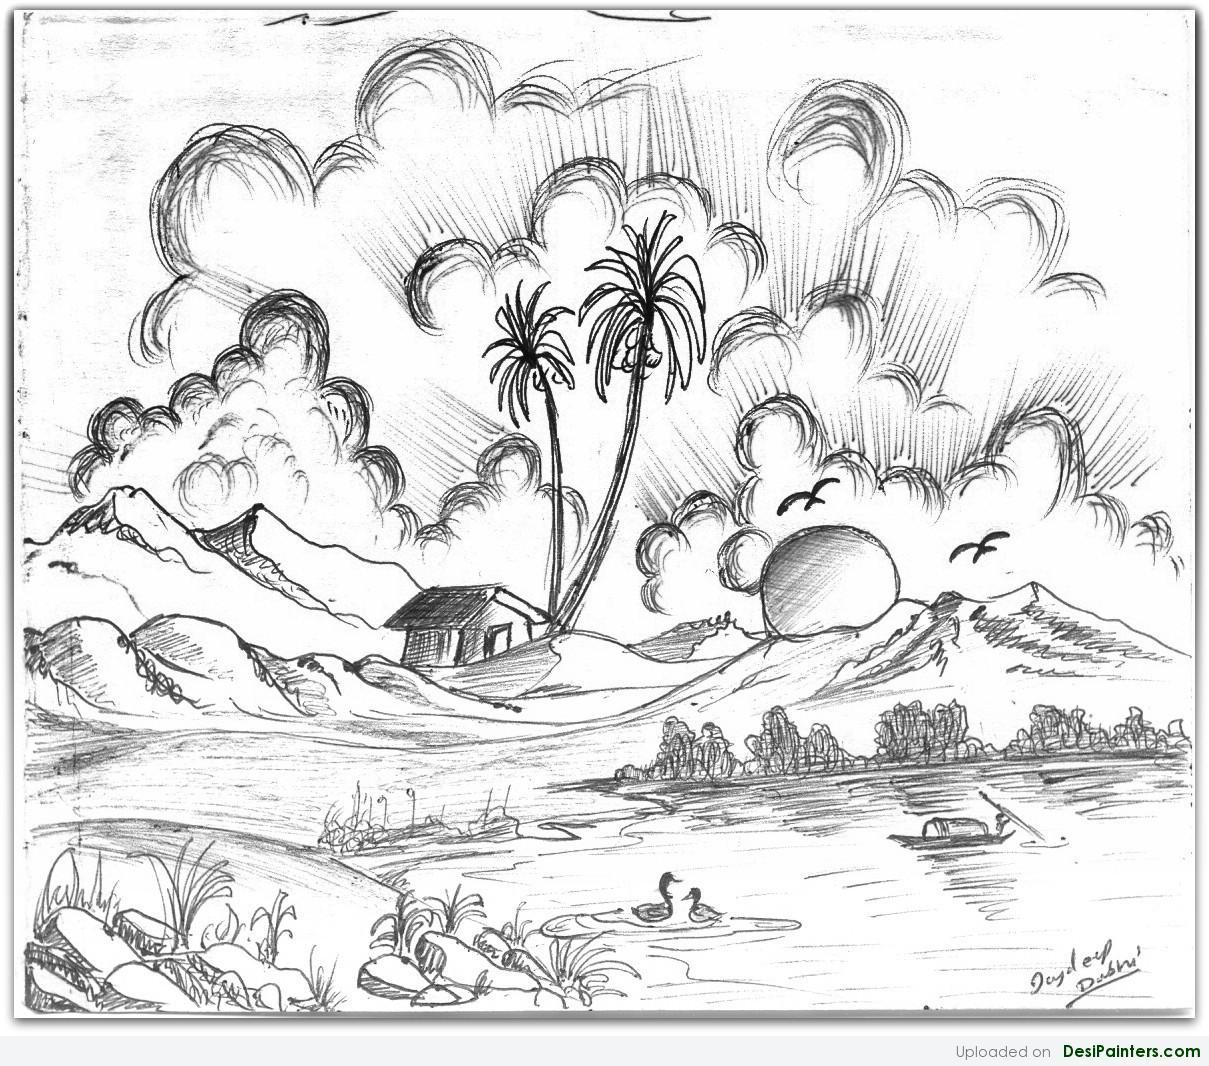 1209x1066 Pencil Sketch Of A Scenery By Jaydeep